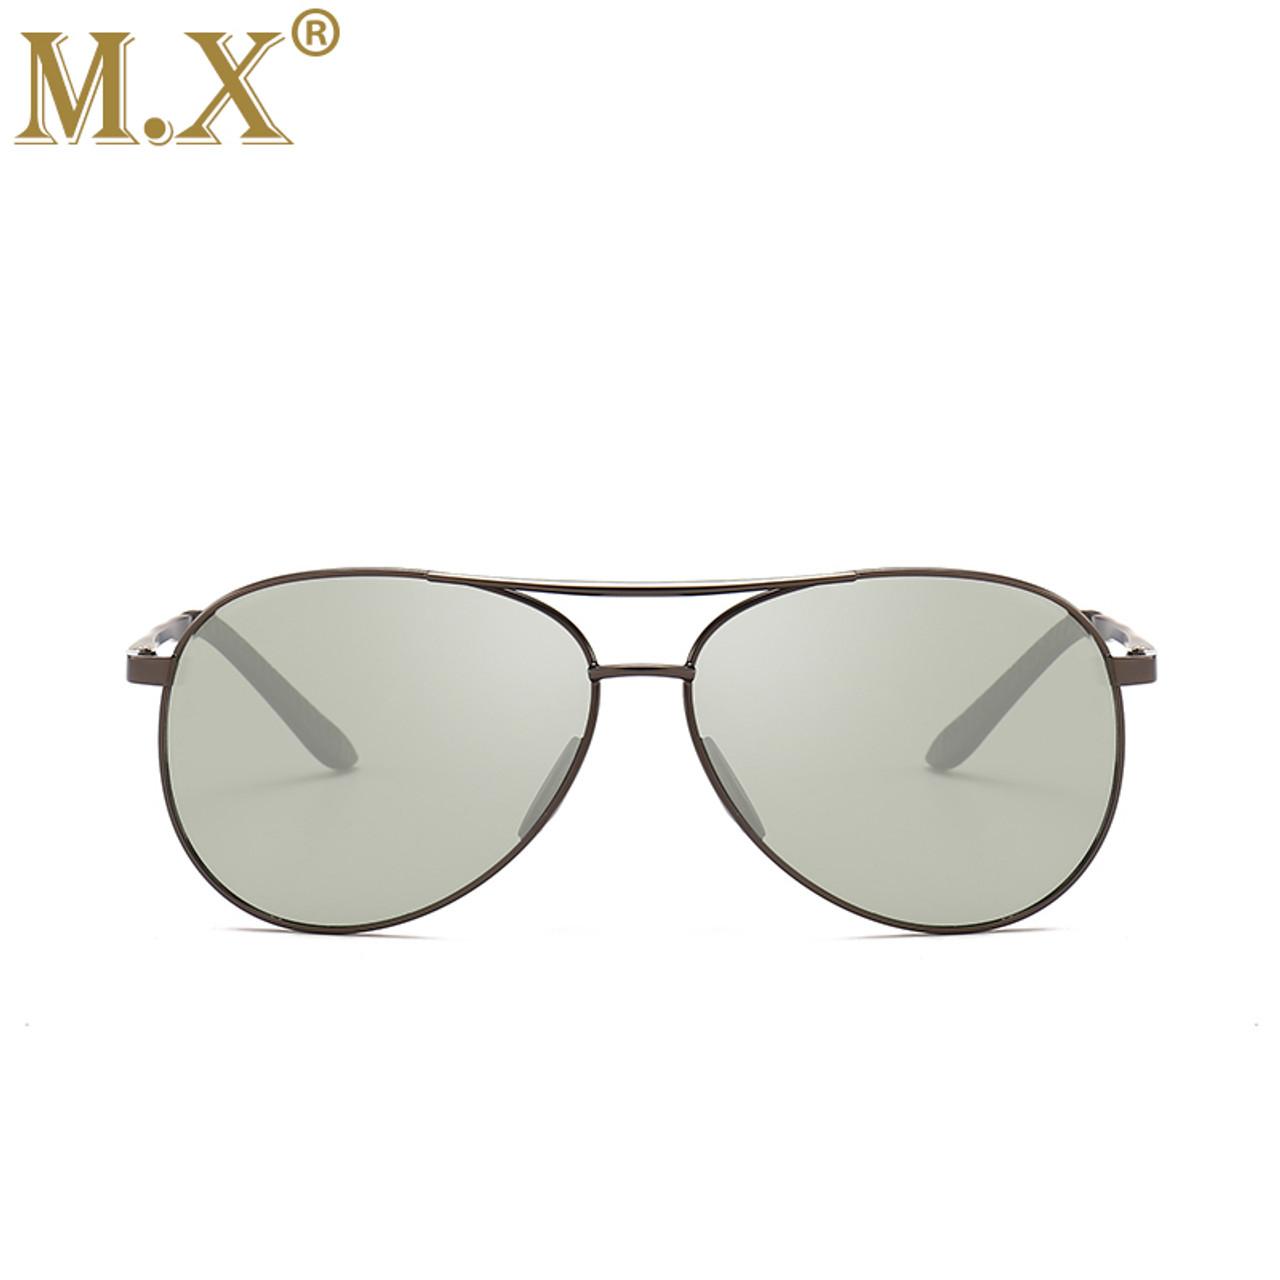 3bb7756350 ... 2018 Pilot Photochromic Sunglasses Men Driving Polarized Sun Glasses  Chameleon Driver Safety Night Vision Goggles Glasses ...